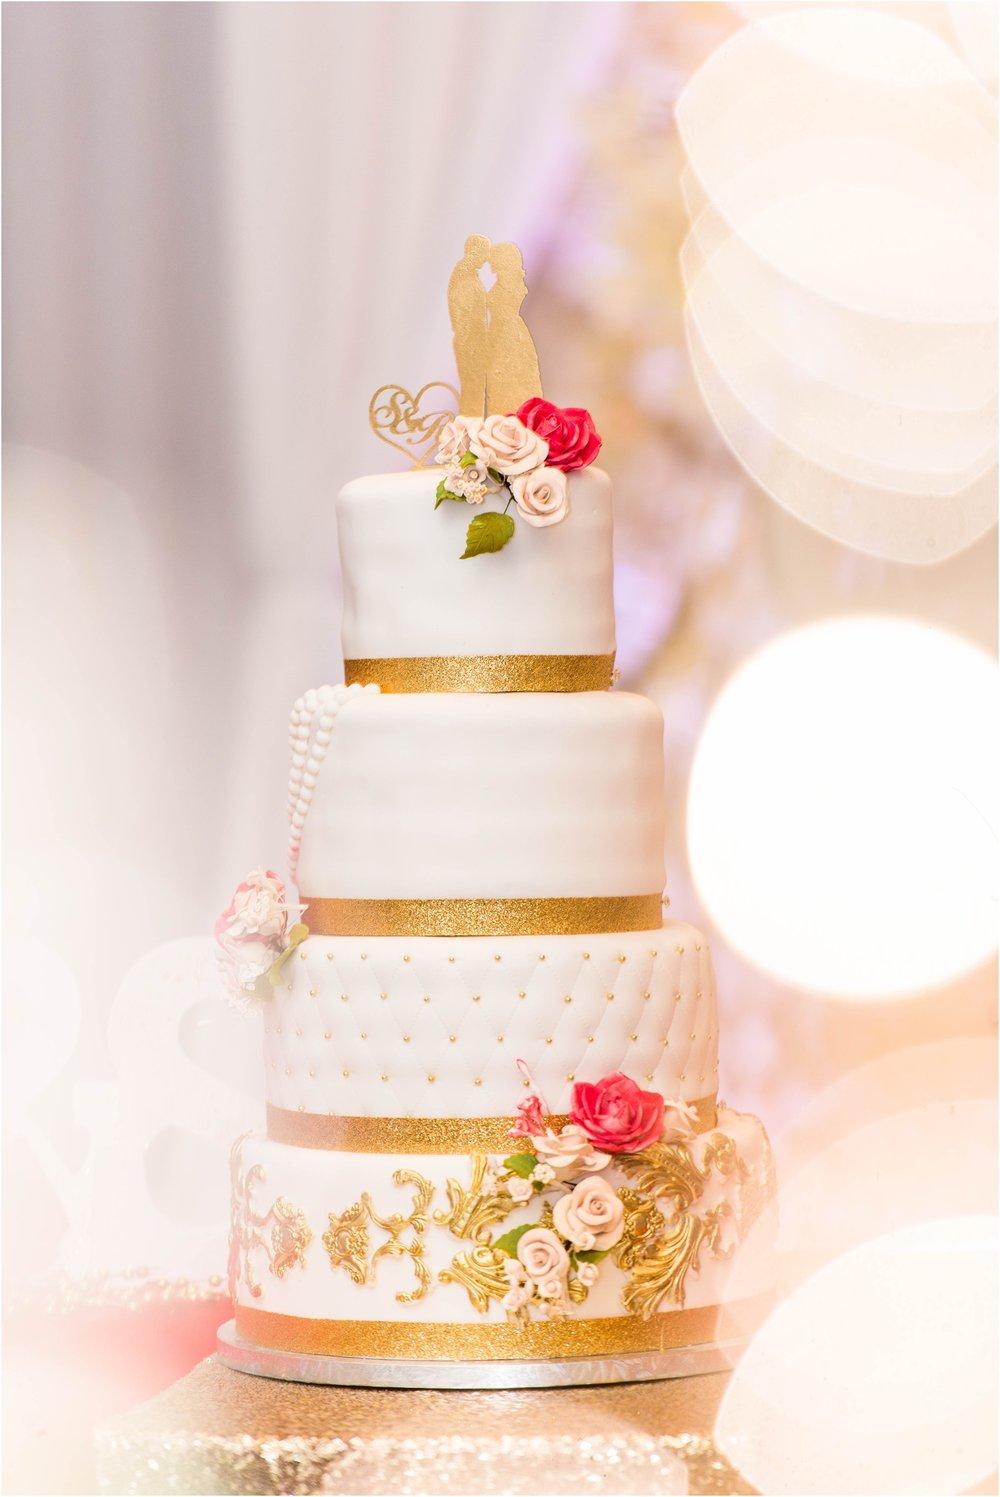 Best-of-2017-Weddings-Toronto-Mississauga-Brampton-Scarborough-GTA-Pakistani-Indian-Wedding-Engagement-Photographer-Photography_0074.jpg